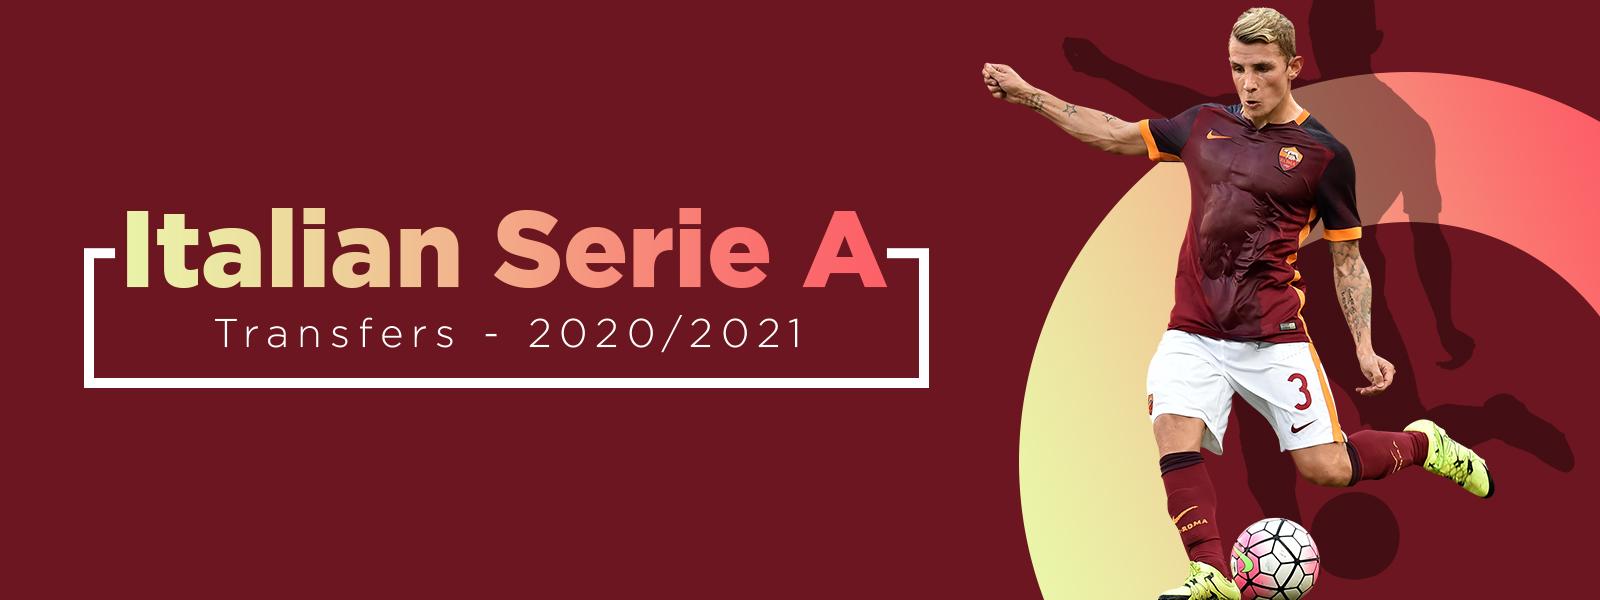 2020/2021 Italy Serie A Transfer Reviews